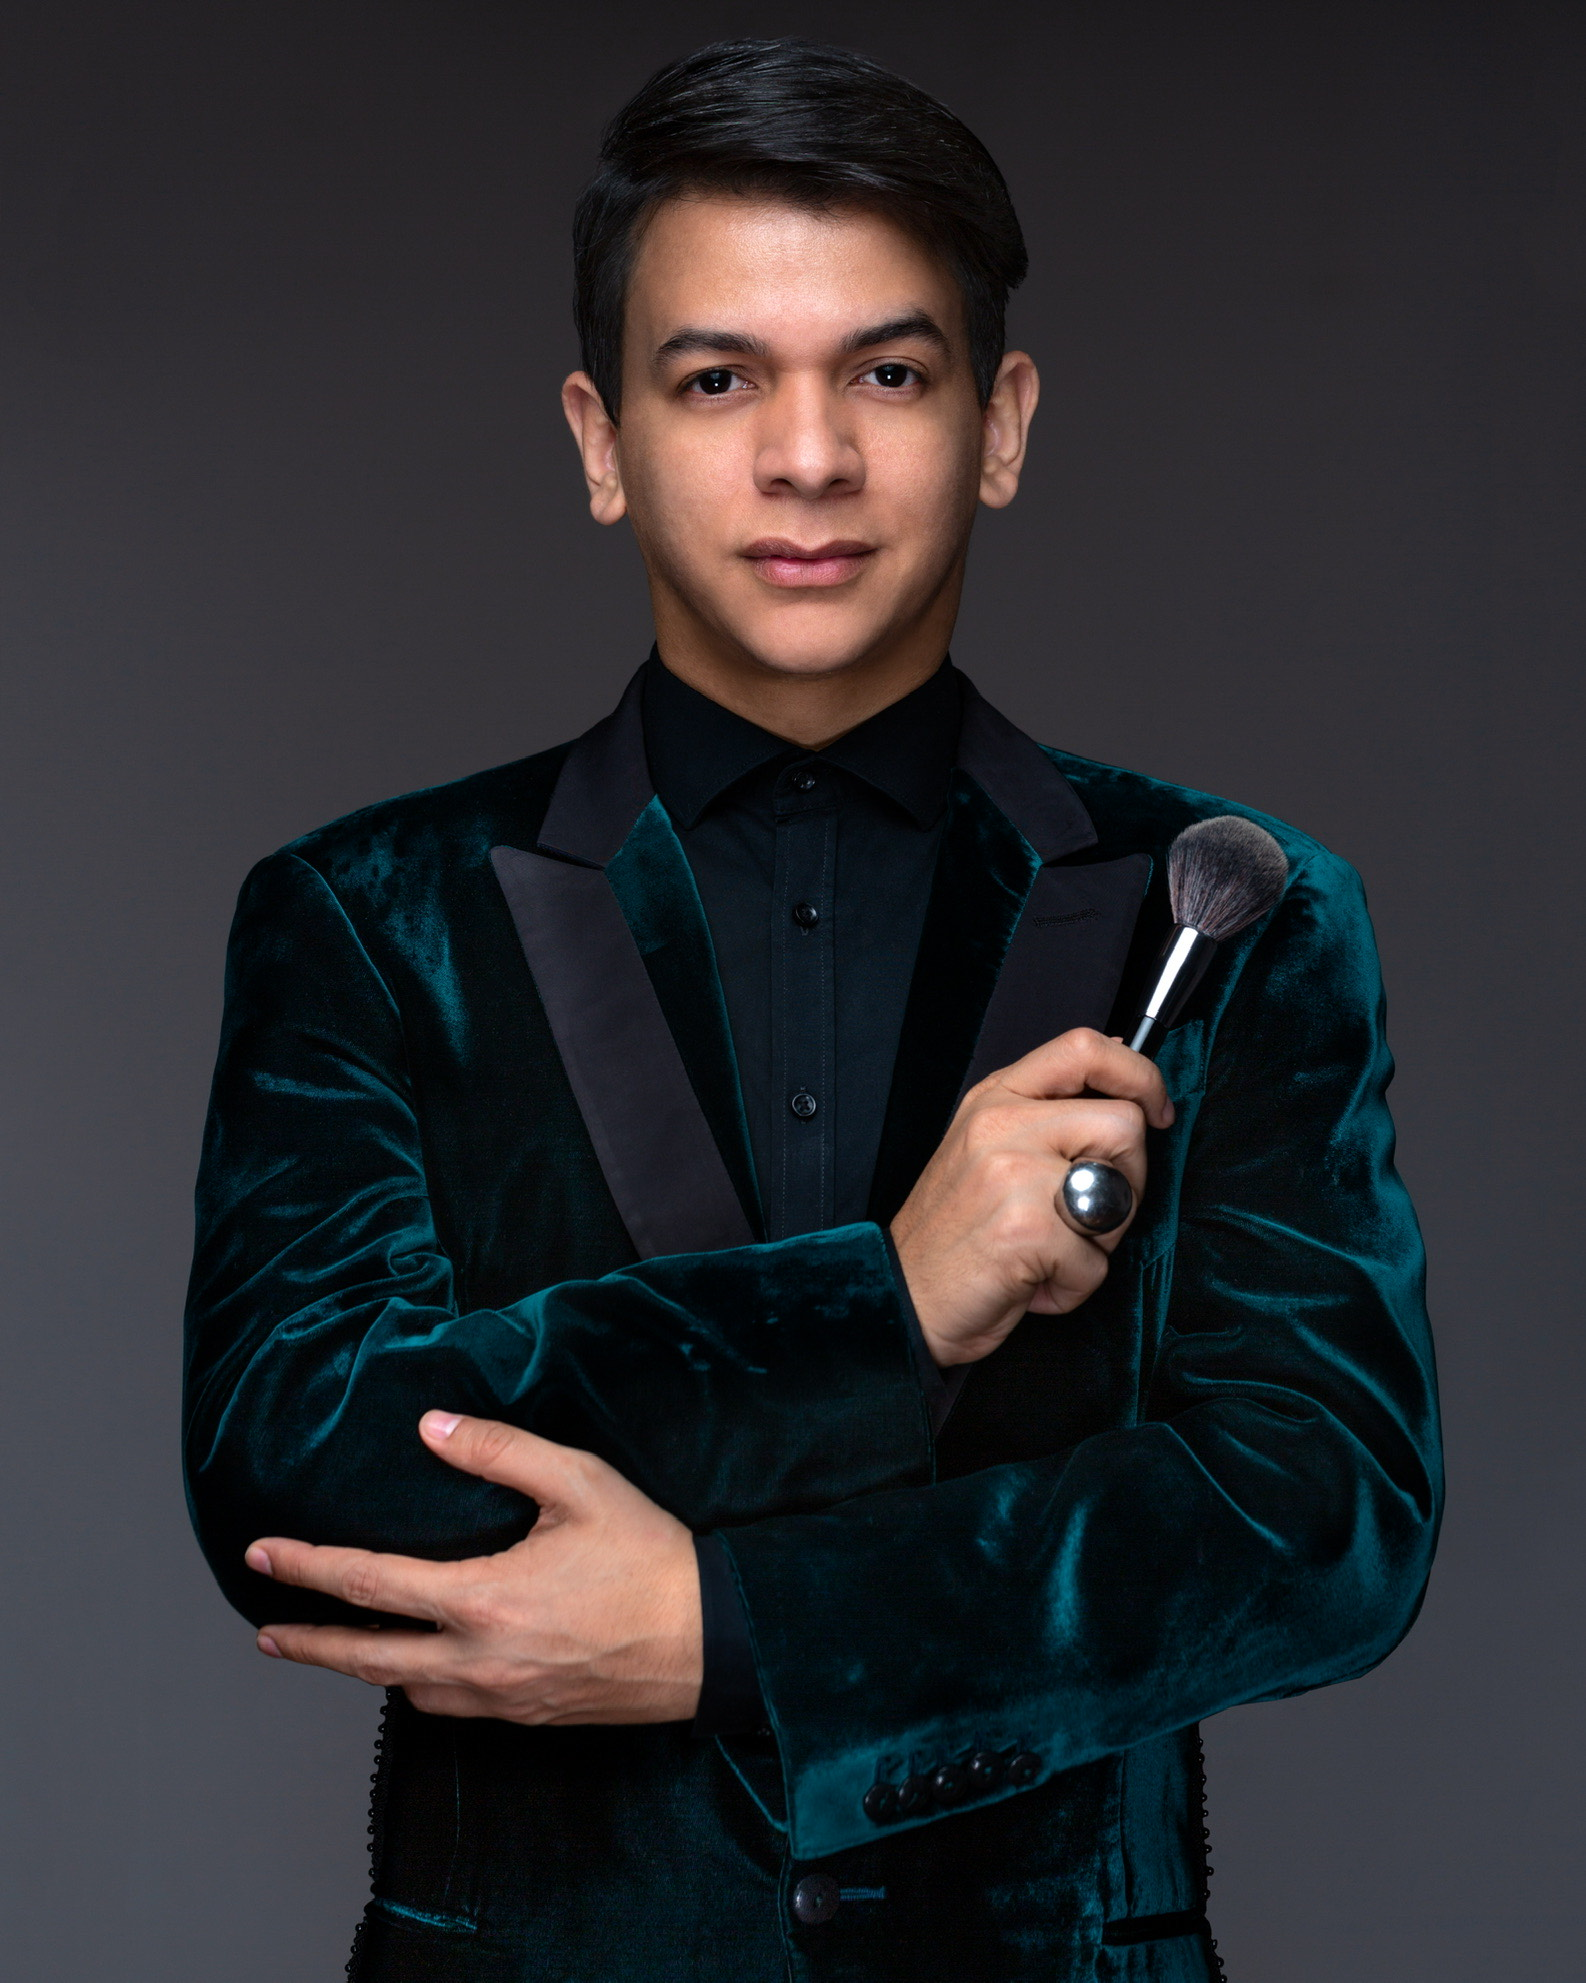 En el marco del Makeup tour 2021, OSKAROSVKY BOYER LLEGA AL TEATRO MUNICIPAL DE CARACAS